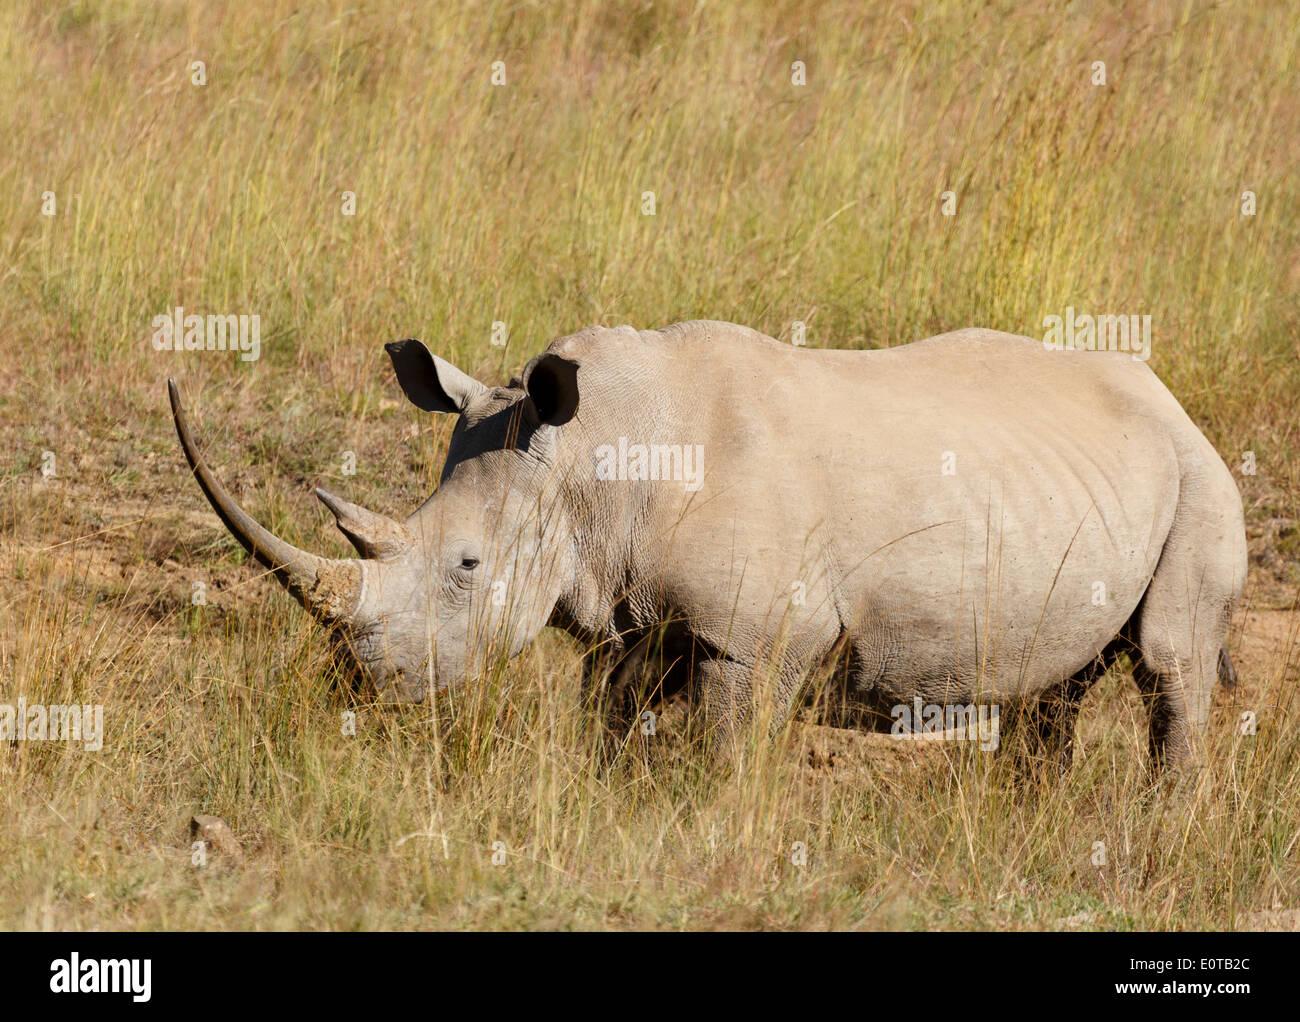 White rhinoceros (Ceratotherium simum) grazing at Pilanesberg National Park, South Africa. - Stock Image